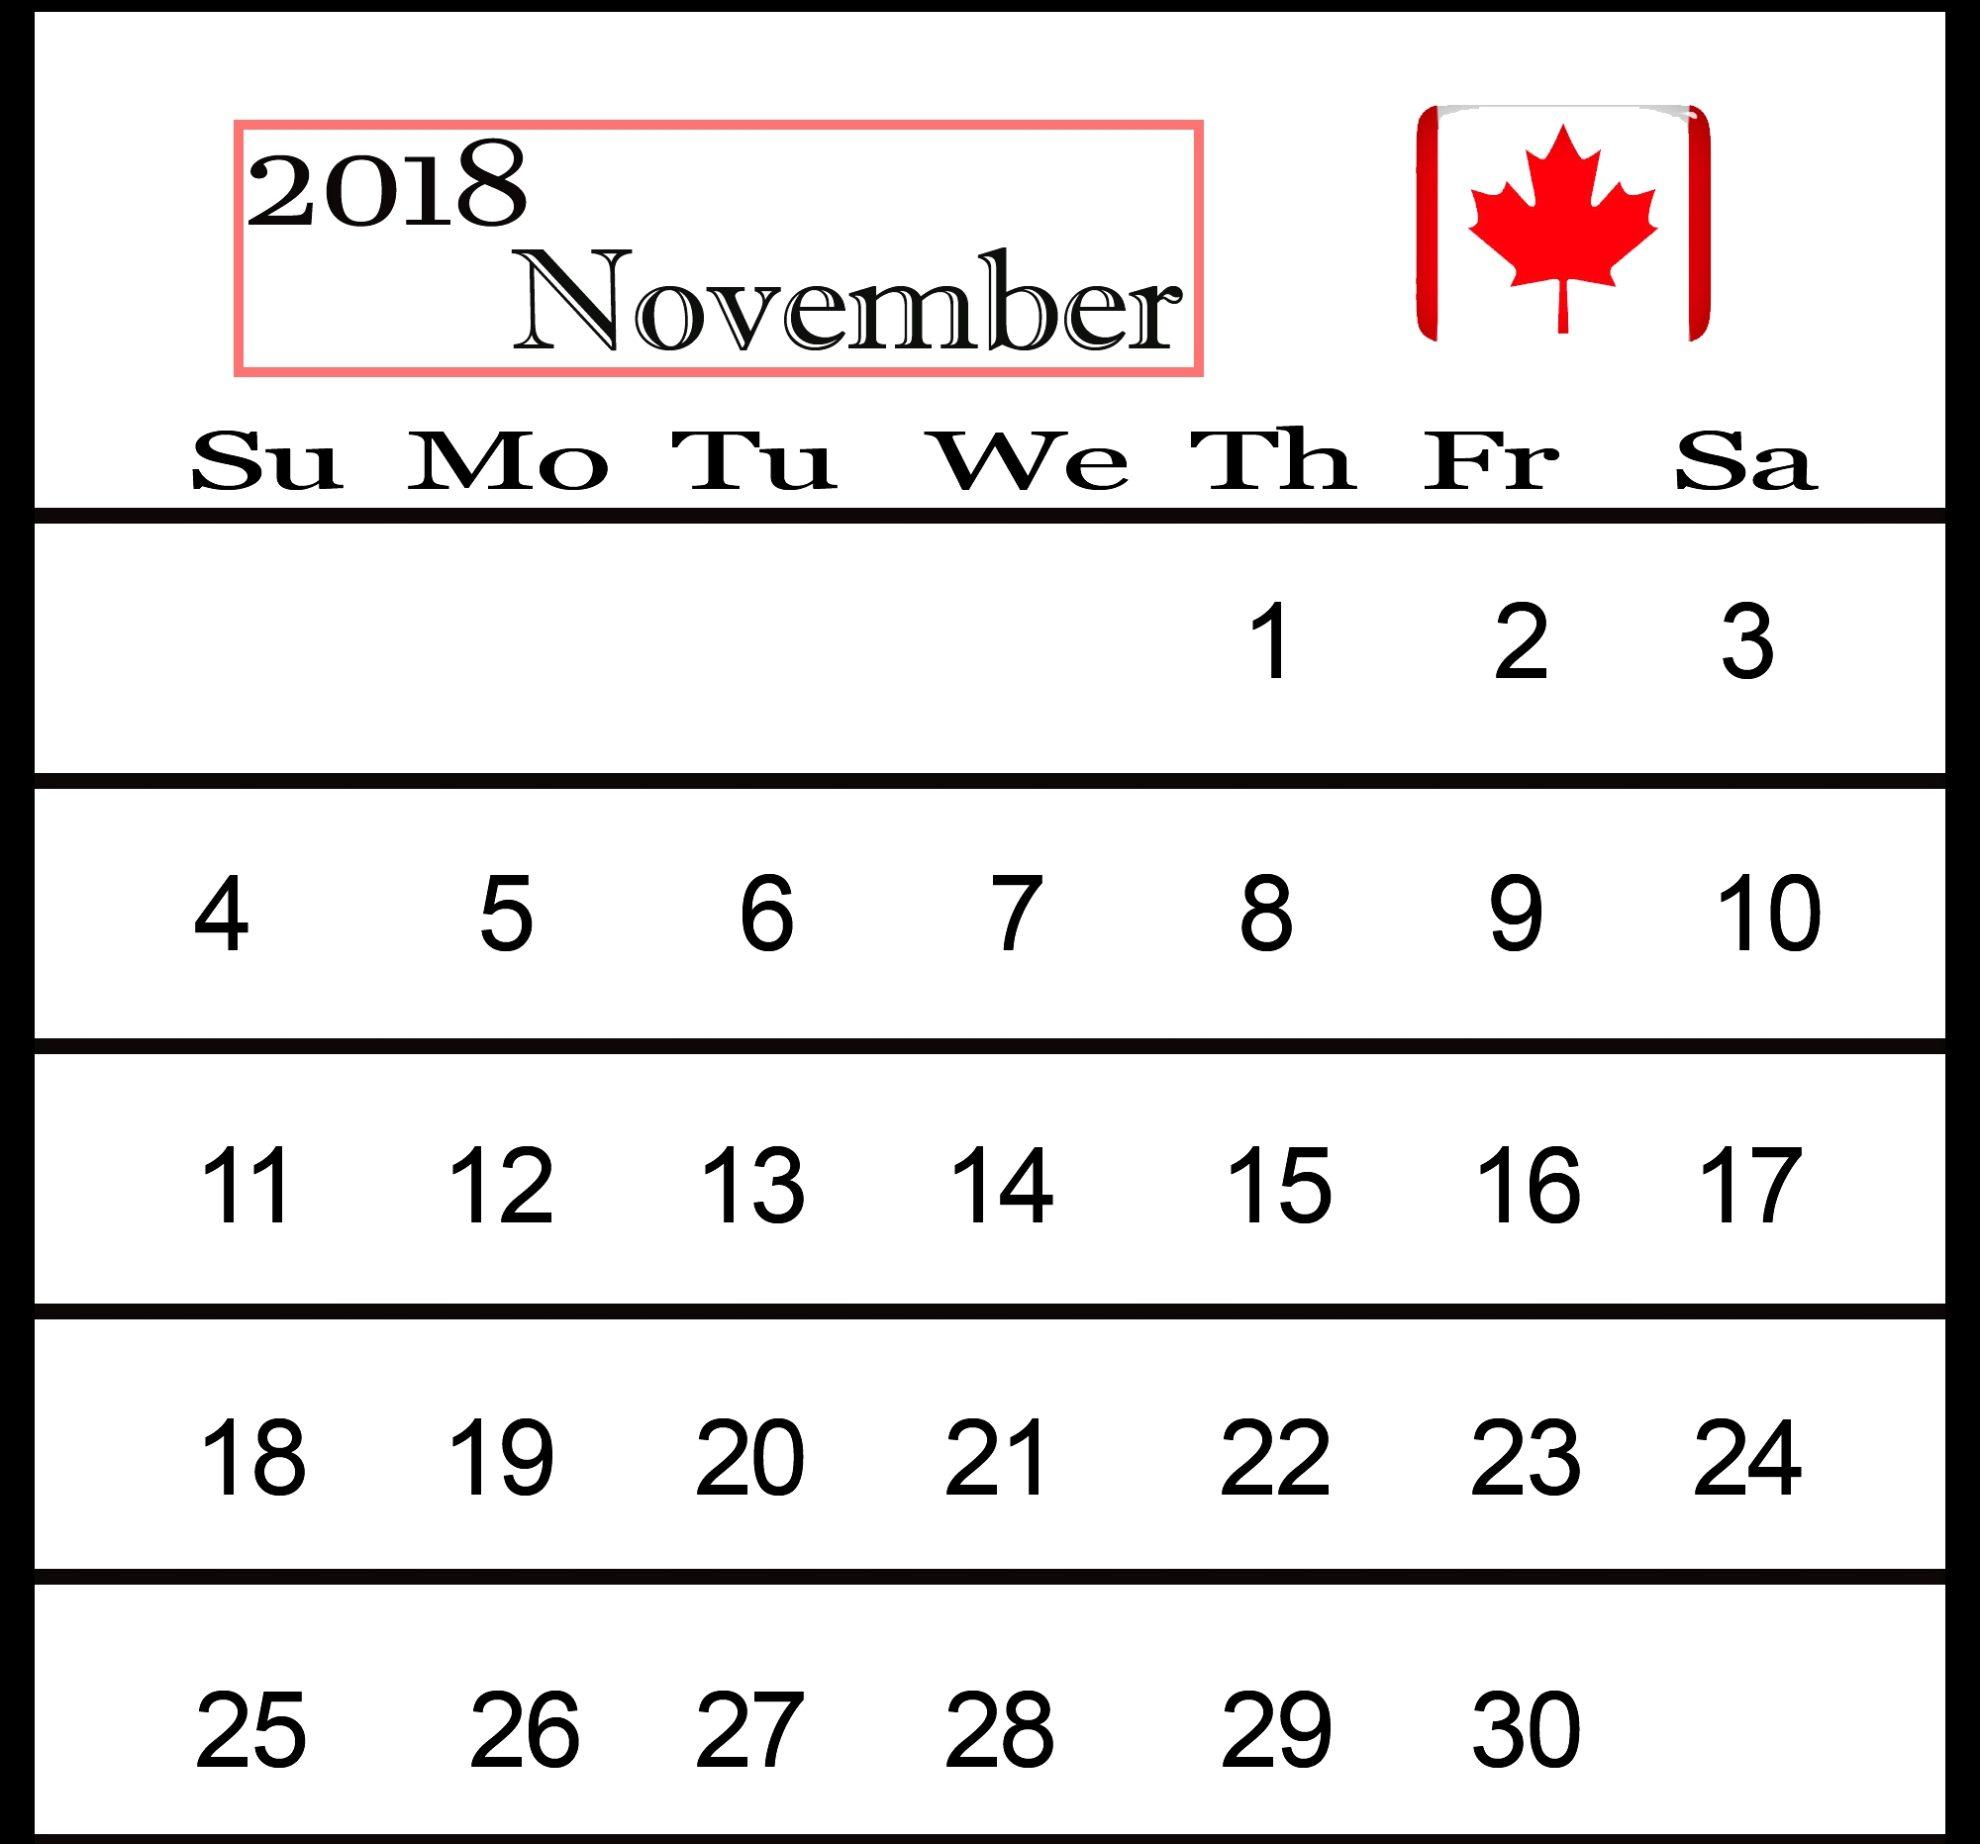 November 2018 Calendar Holidays